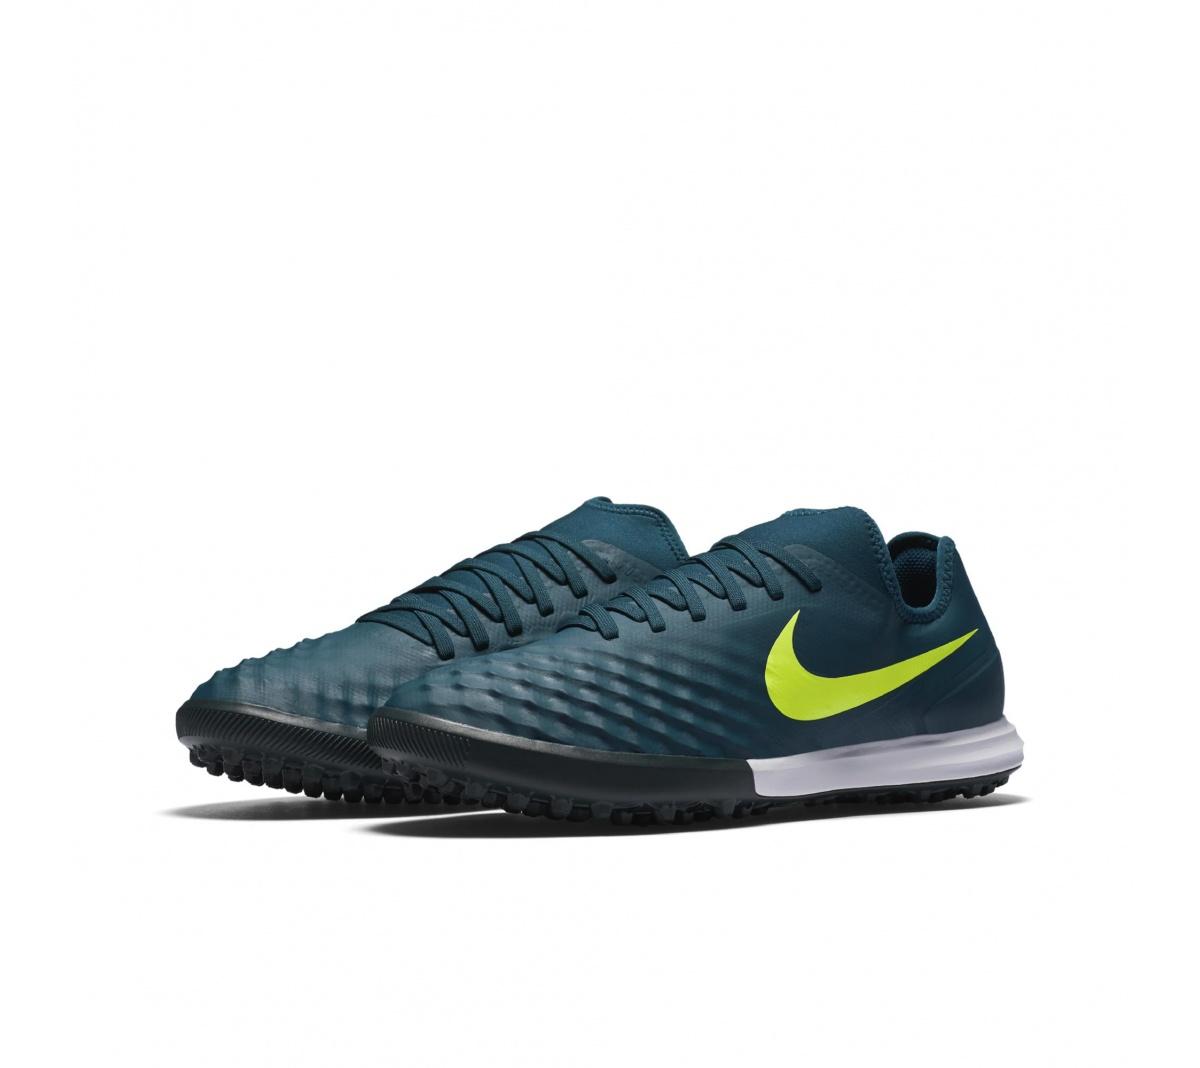 Chuteira Nike Magistax Finale Society New Verde - Mundo do Futebol 905ed4b3c167f